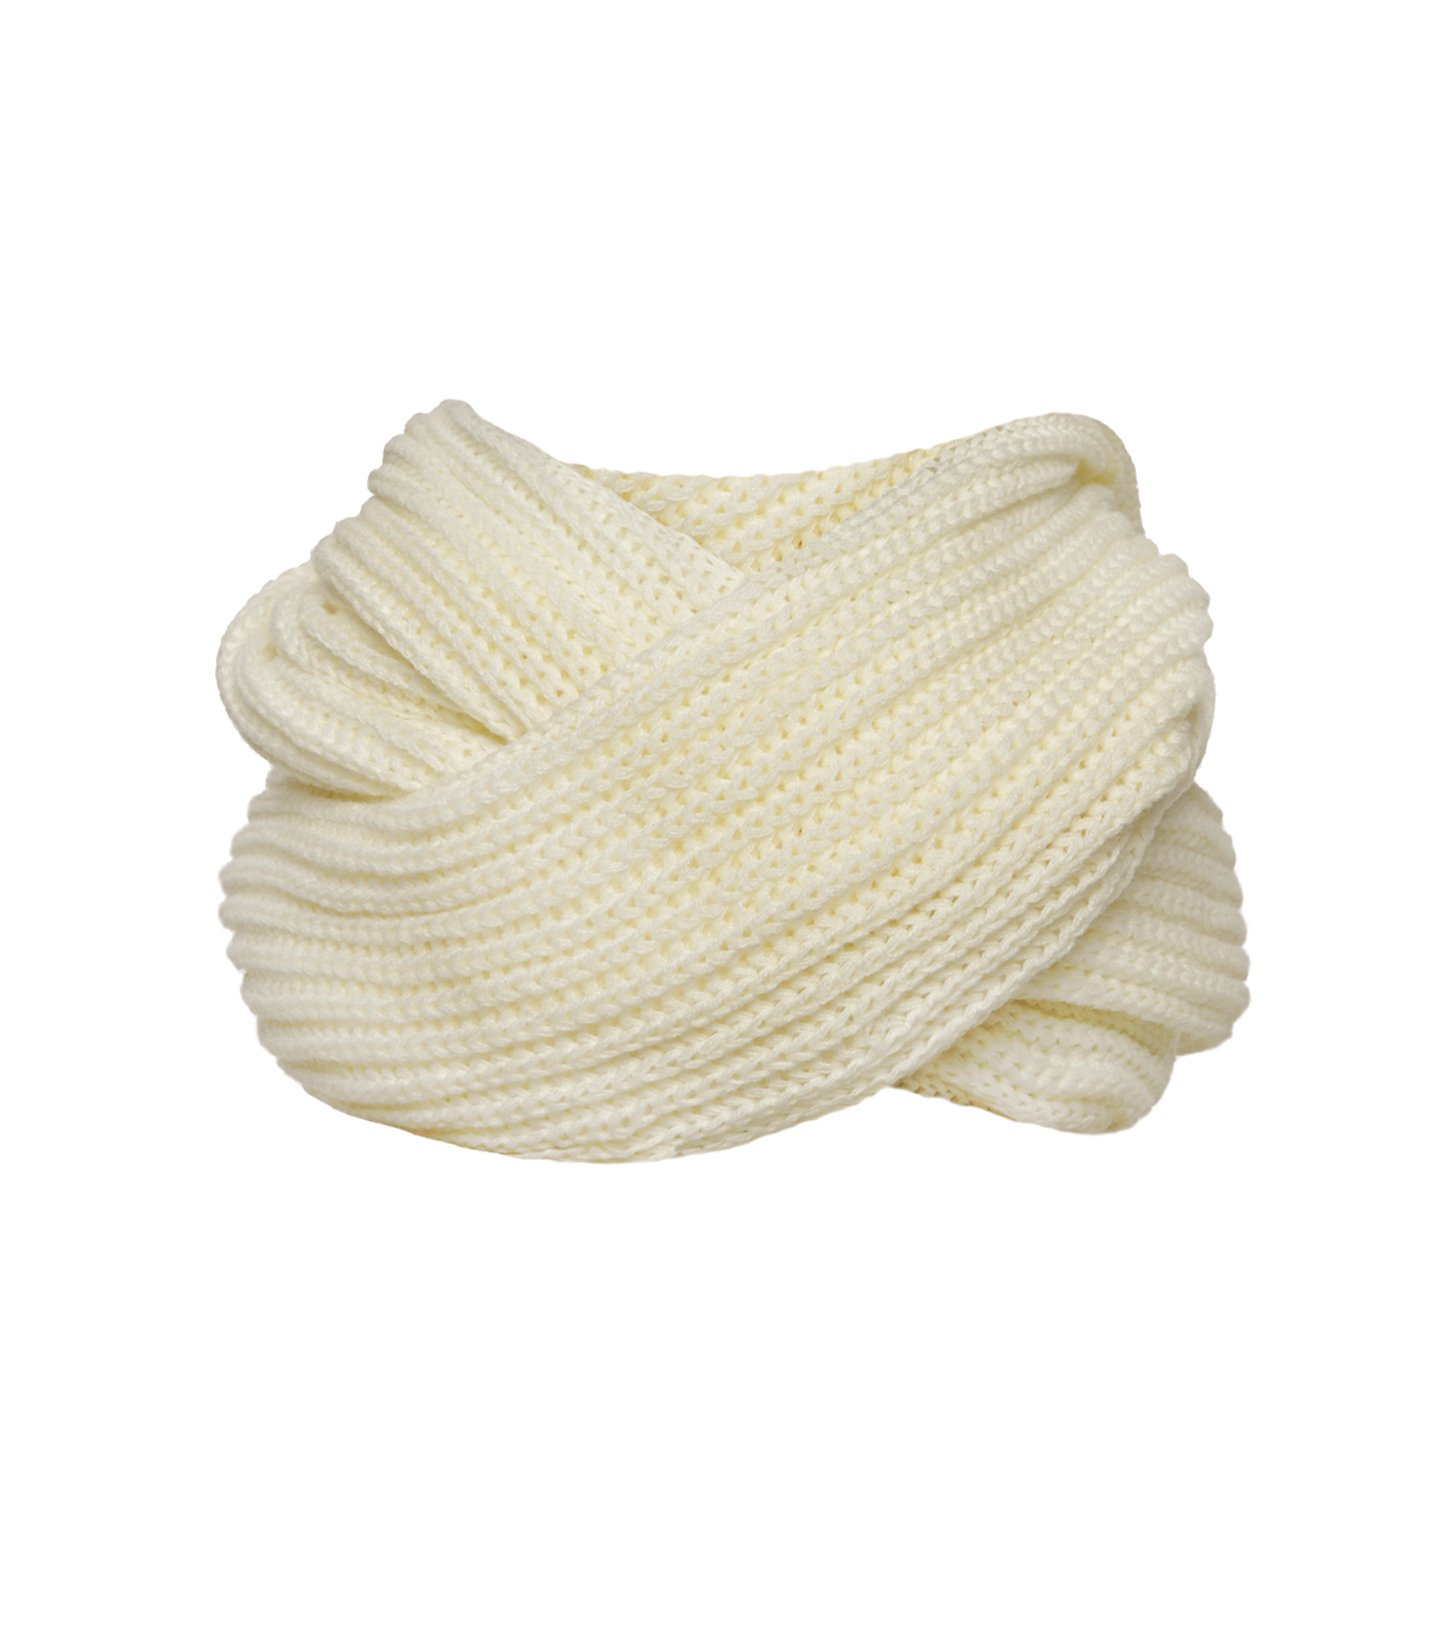 Gola Básica Tricot - 25053